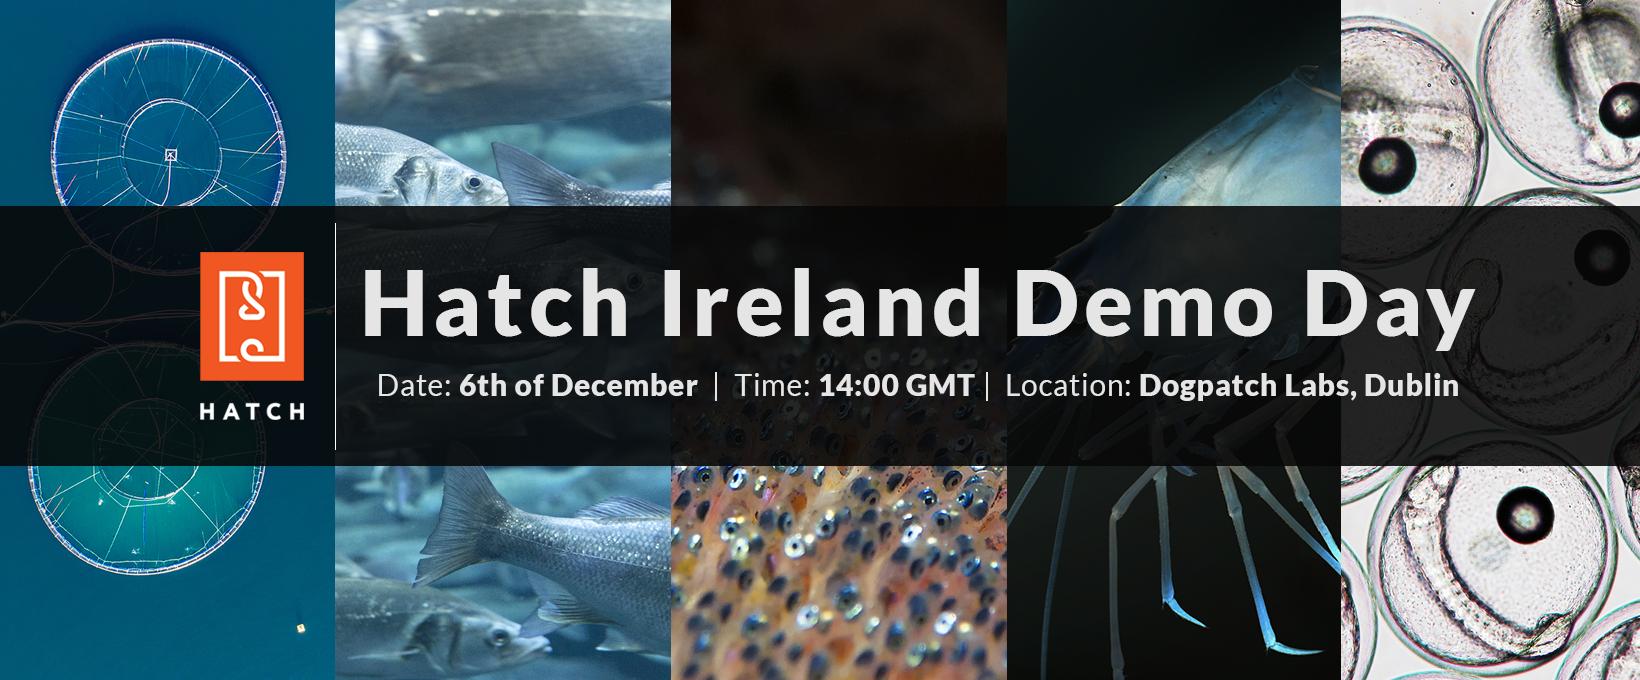 hatch_ireland_demo_day.png